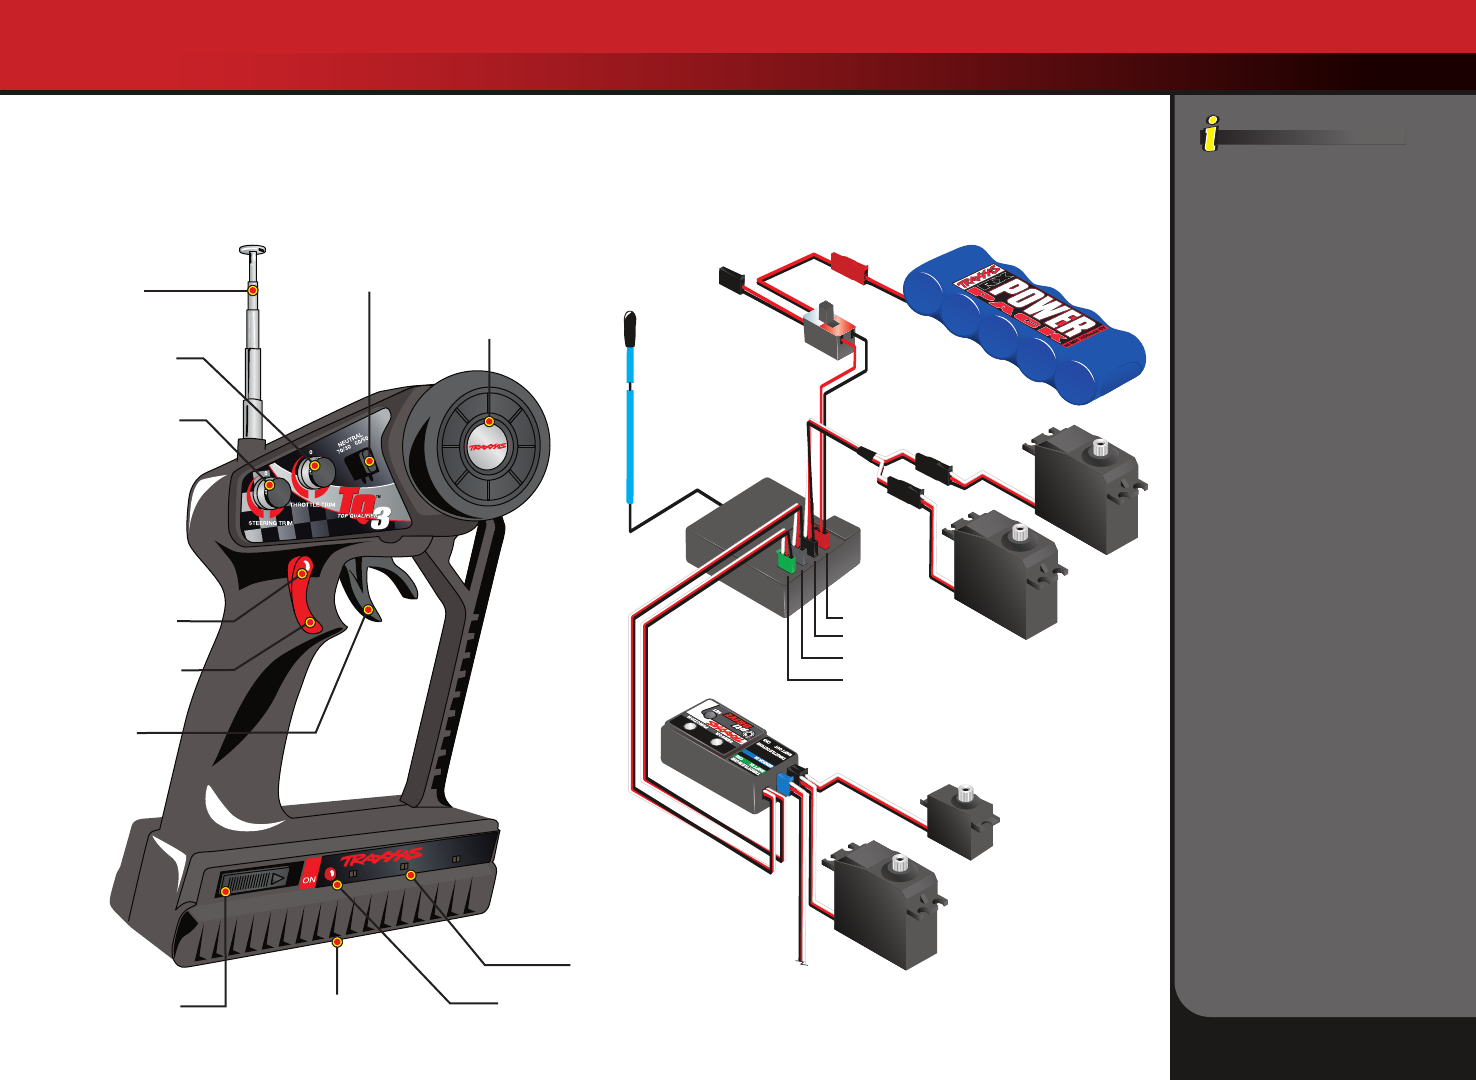 Traxxas Wiring Diagram | Repair Manual on